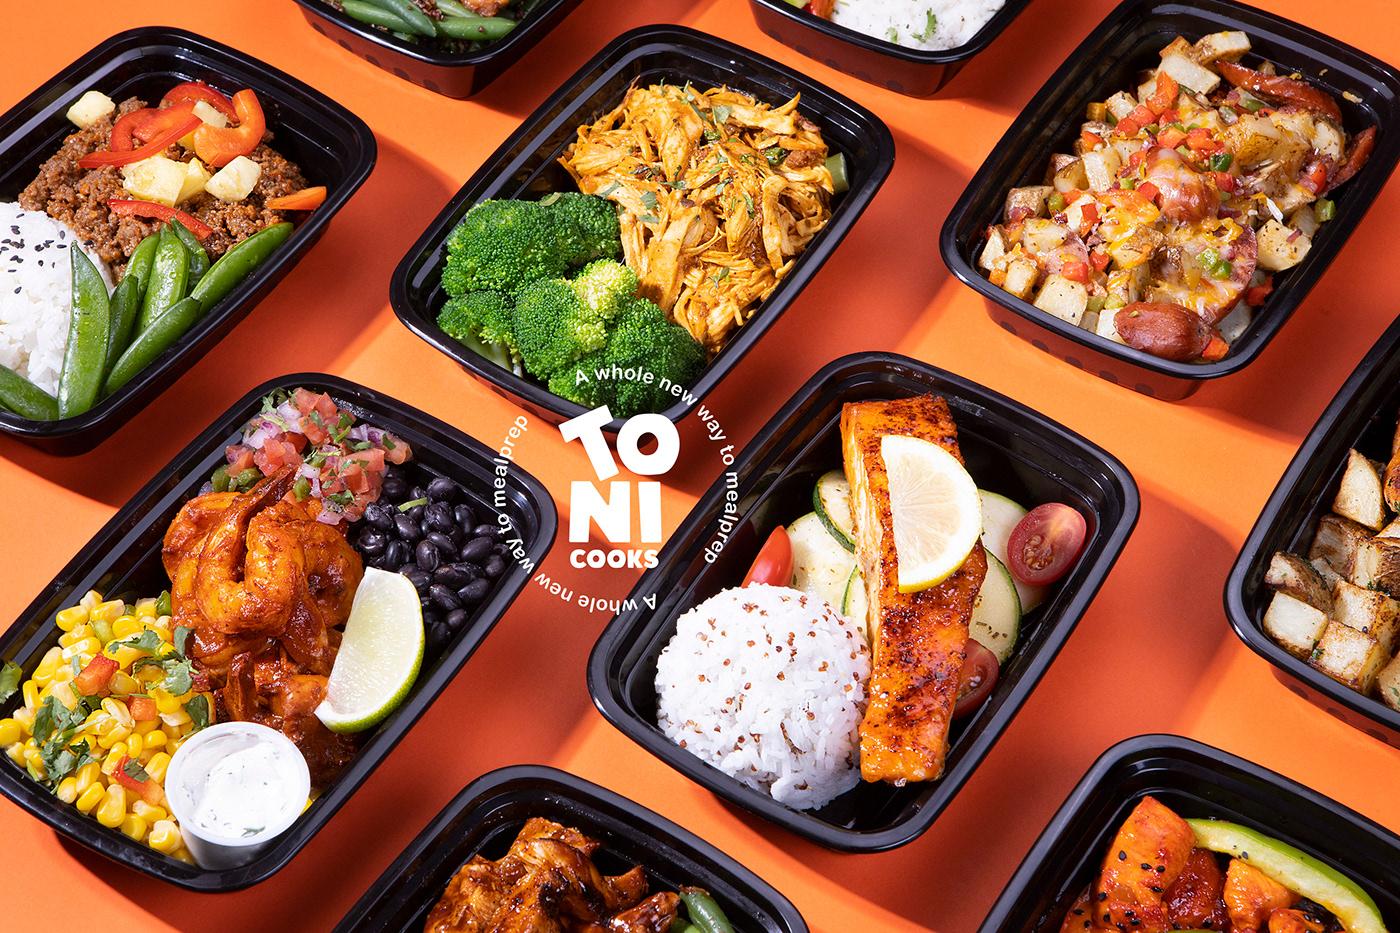 branding  Fast food food delivery Food Packaging healthy healthy food mealprep New York nutrition restaurant